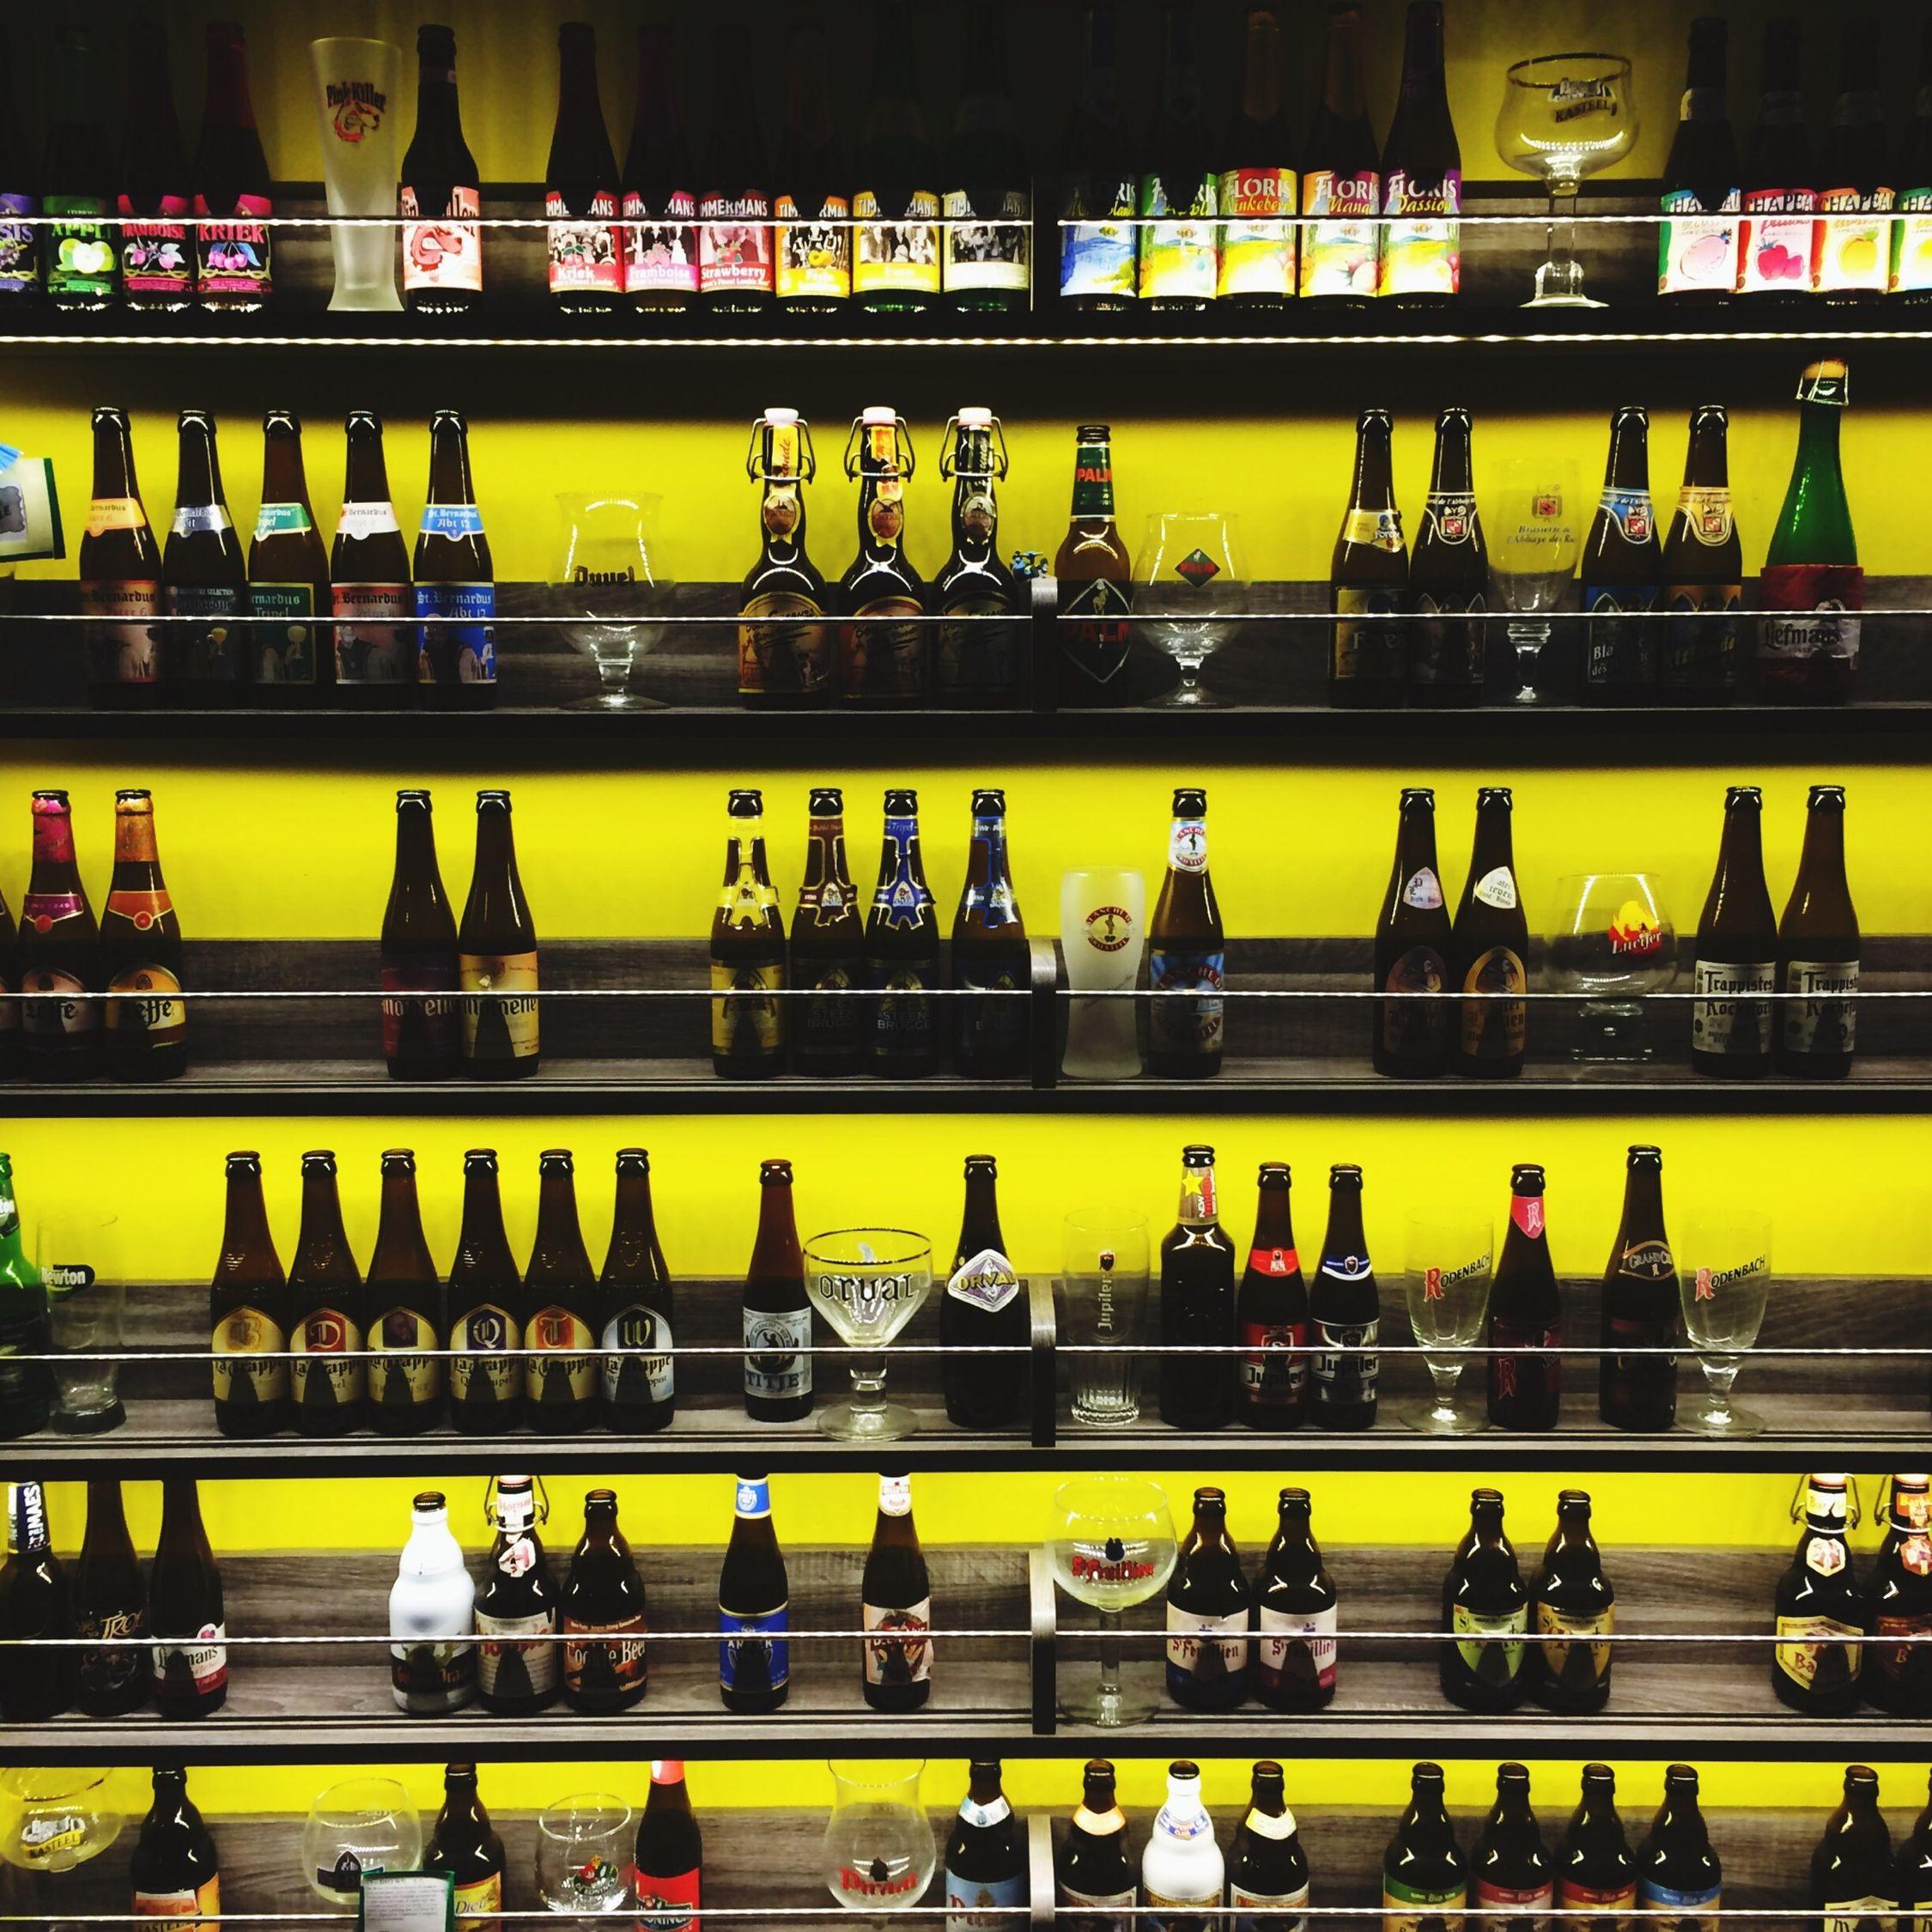 IPhoneography Dinner Beer Bottles